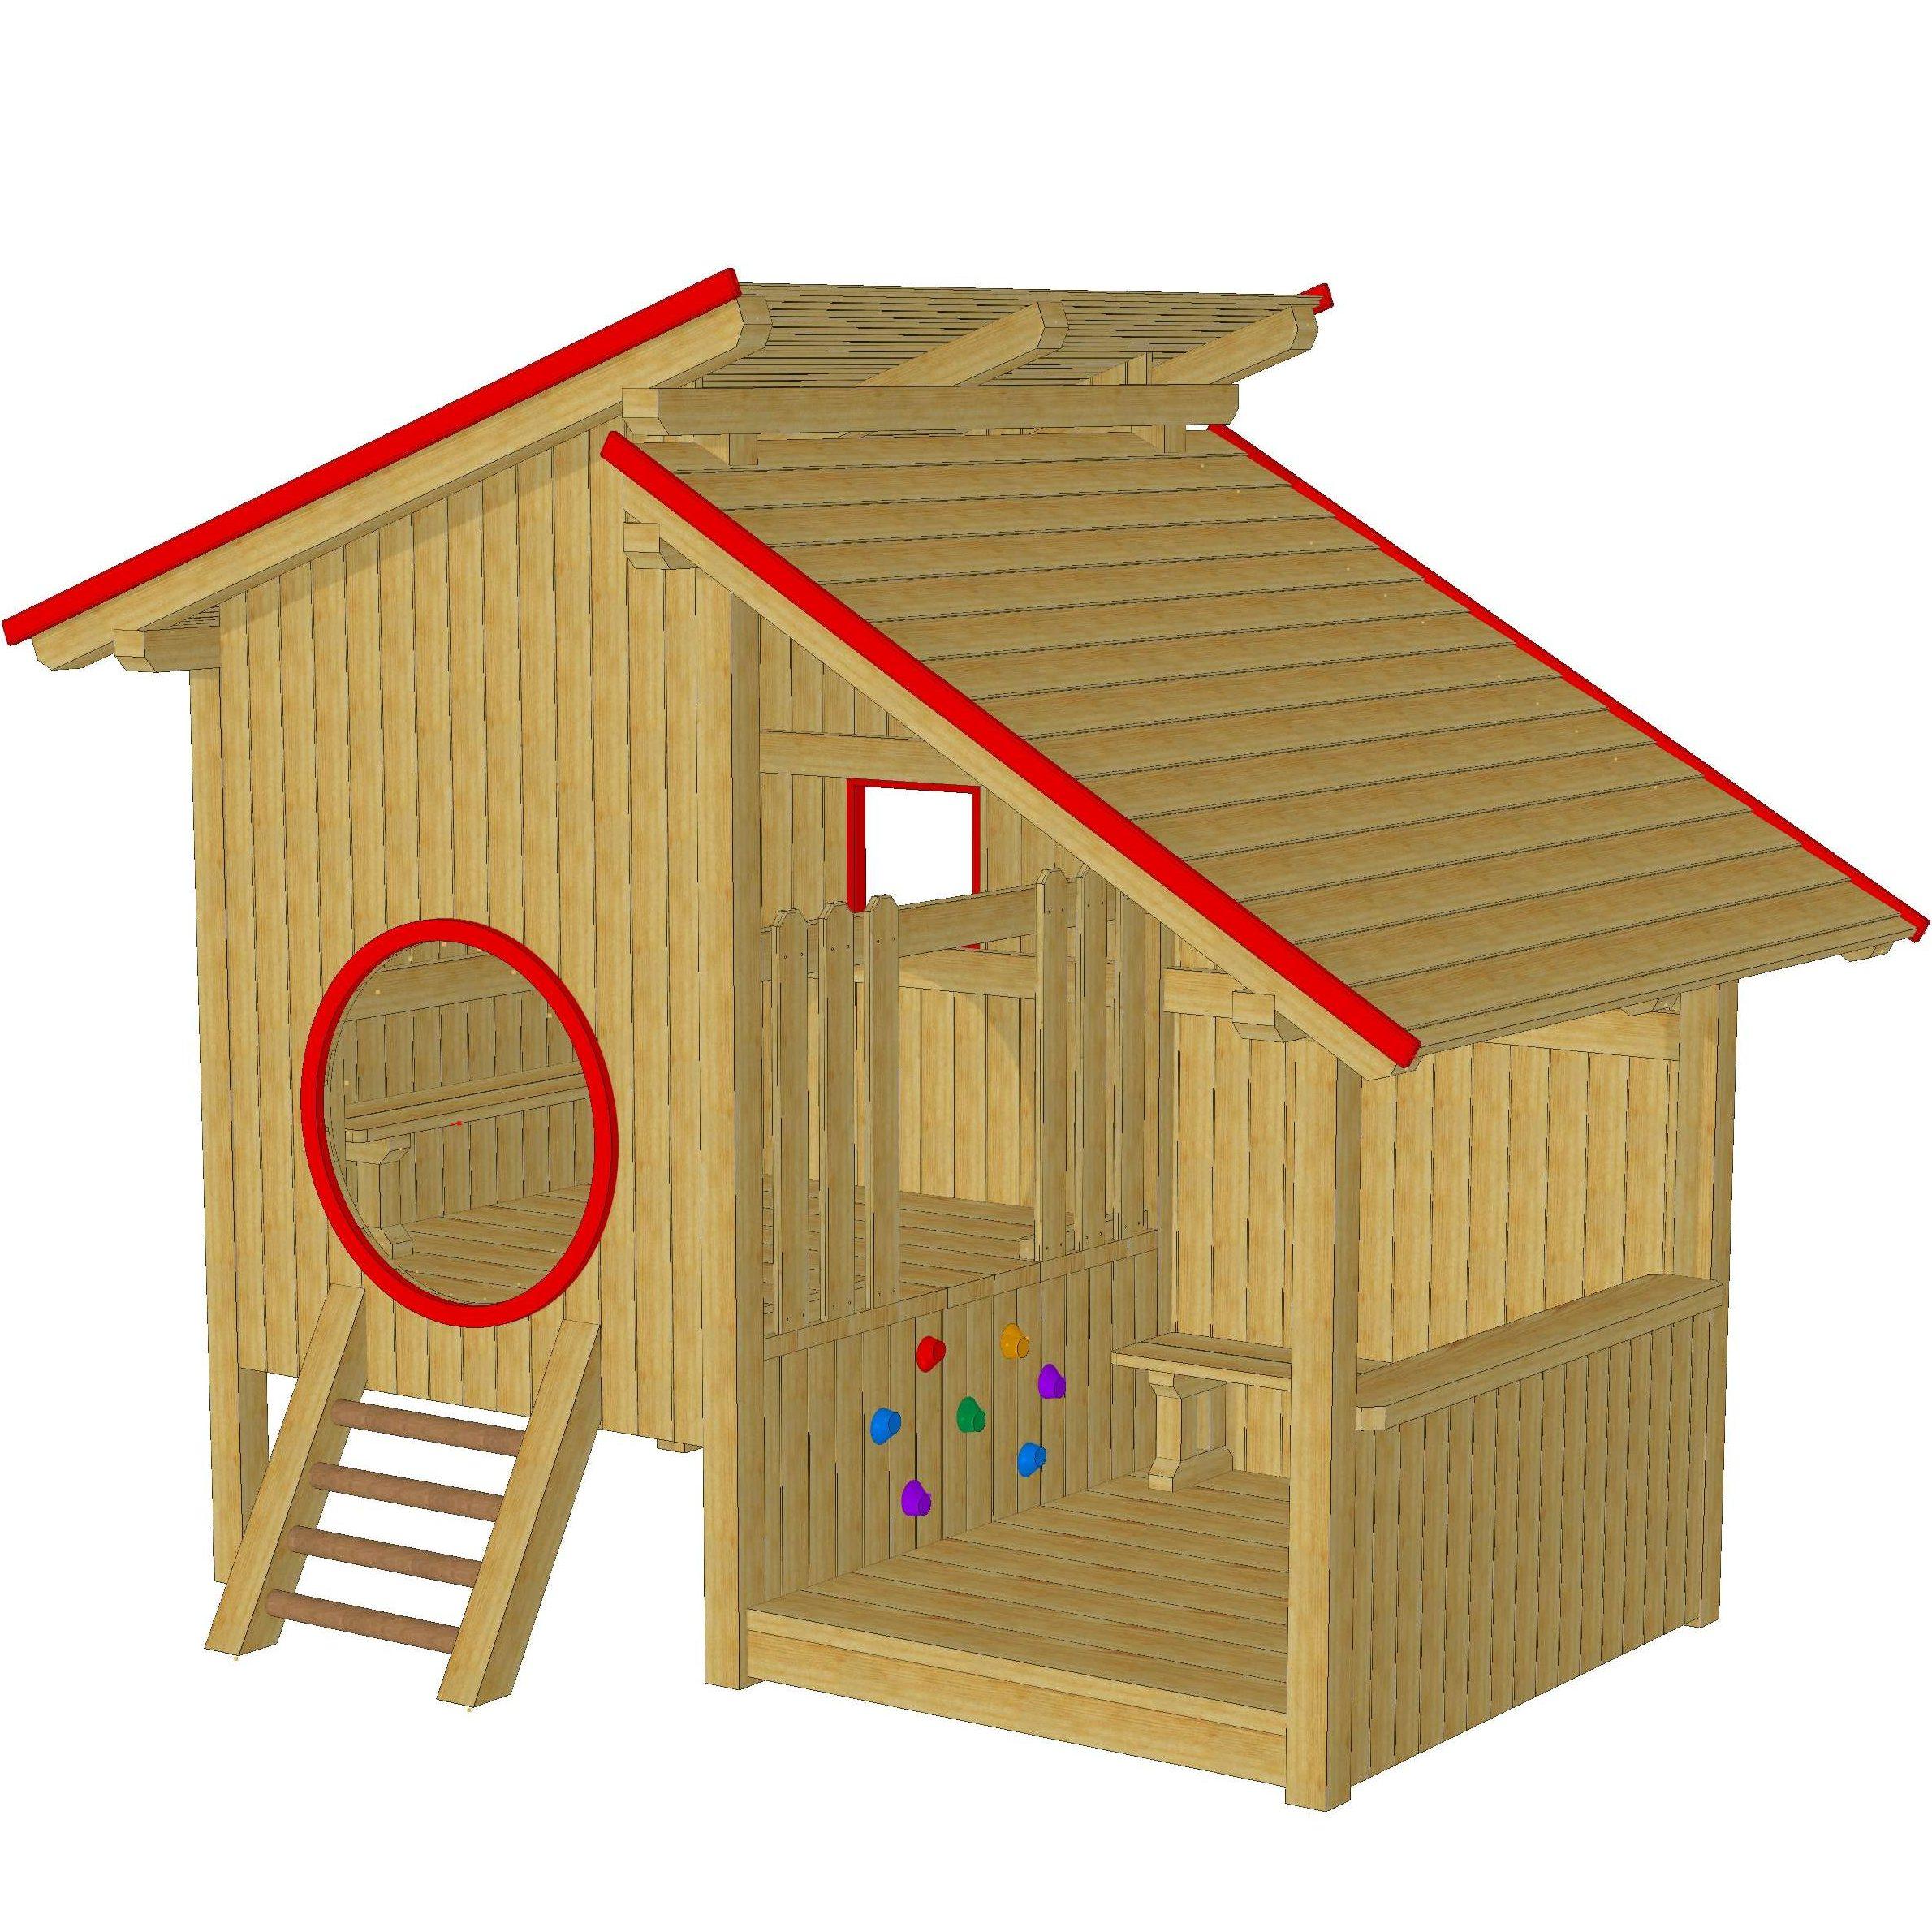 6075_Doppel-Spielhaus3